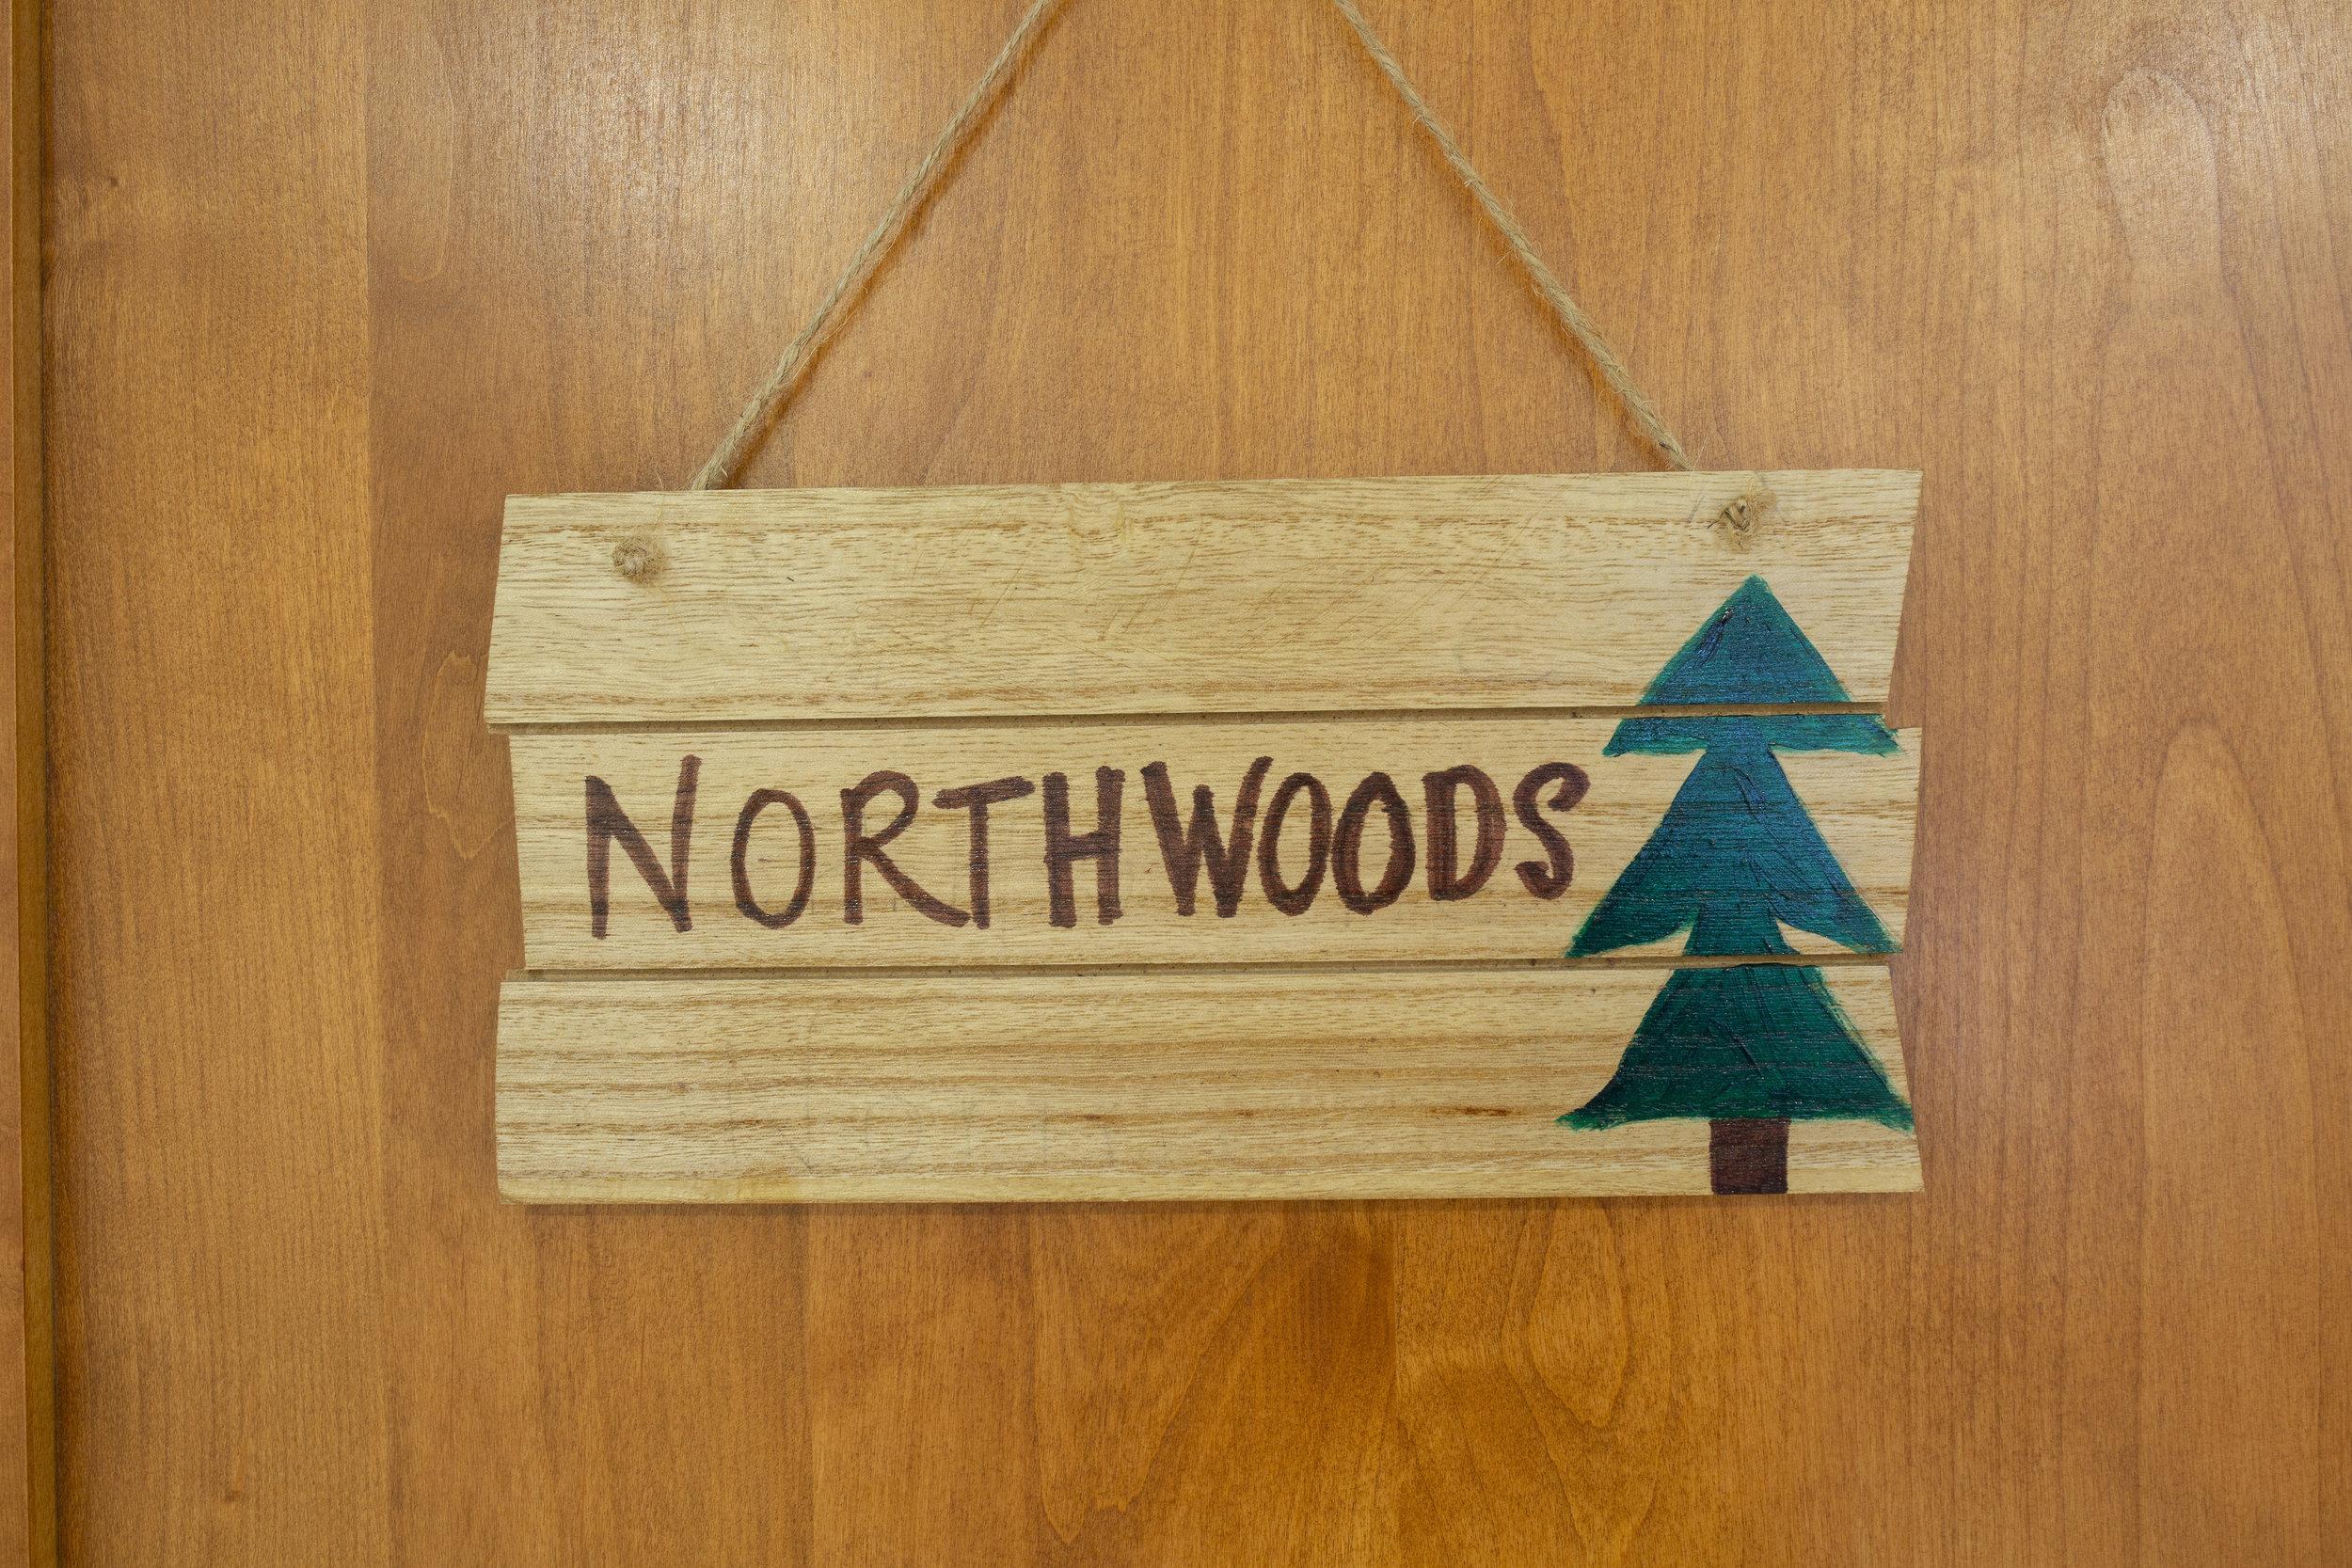 North woods room sign.jpg